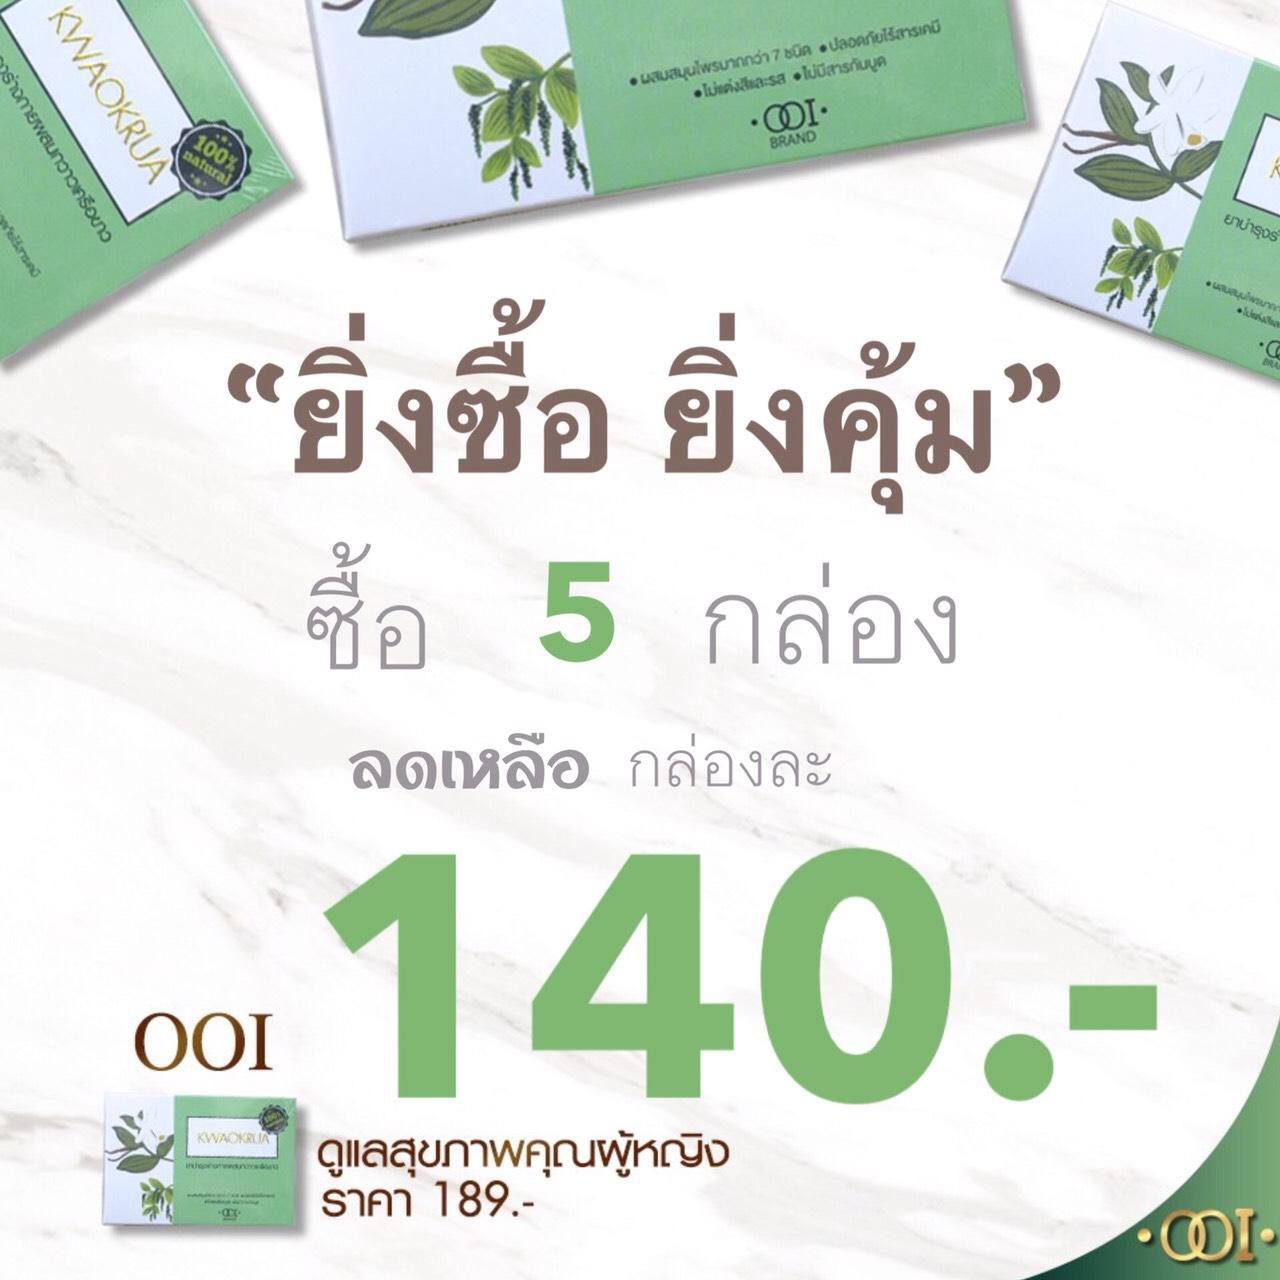 OOI Thailand Fit Fuu Firm ราคา 5 กล่อง